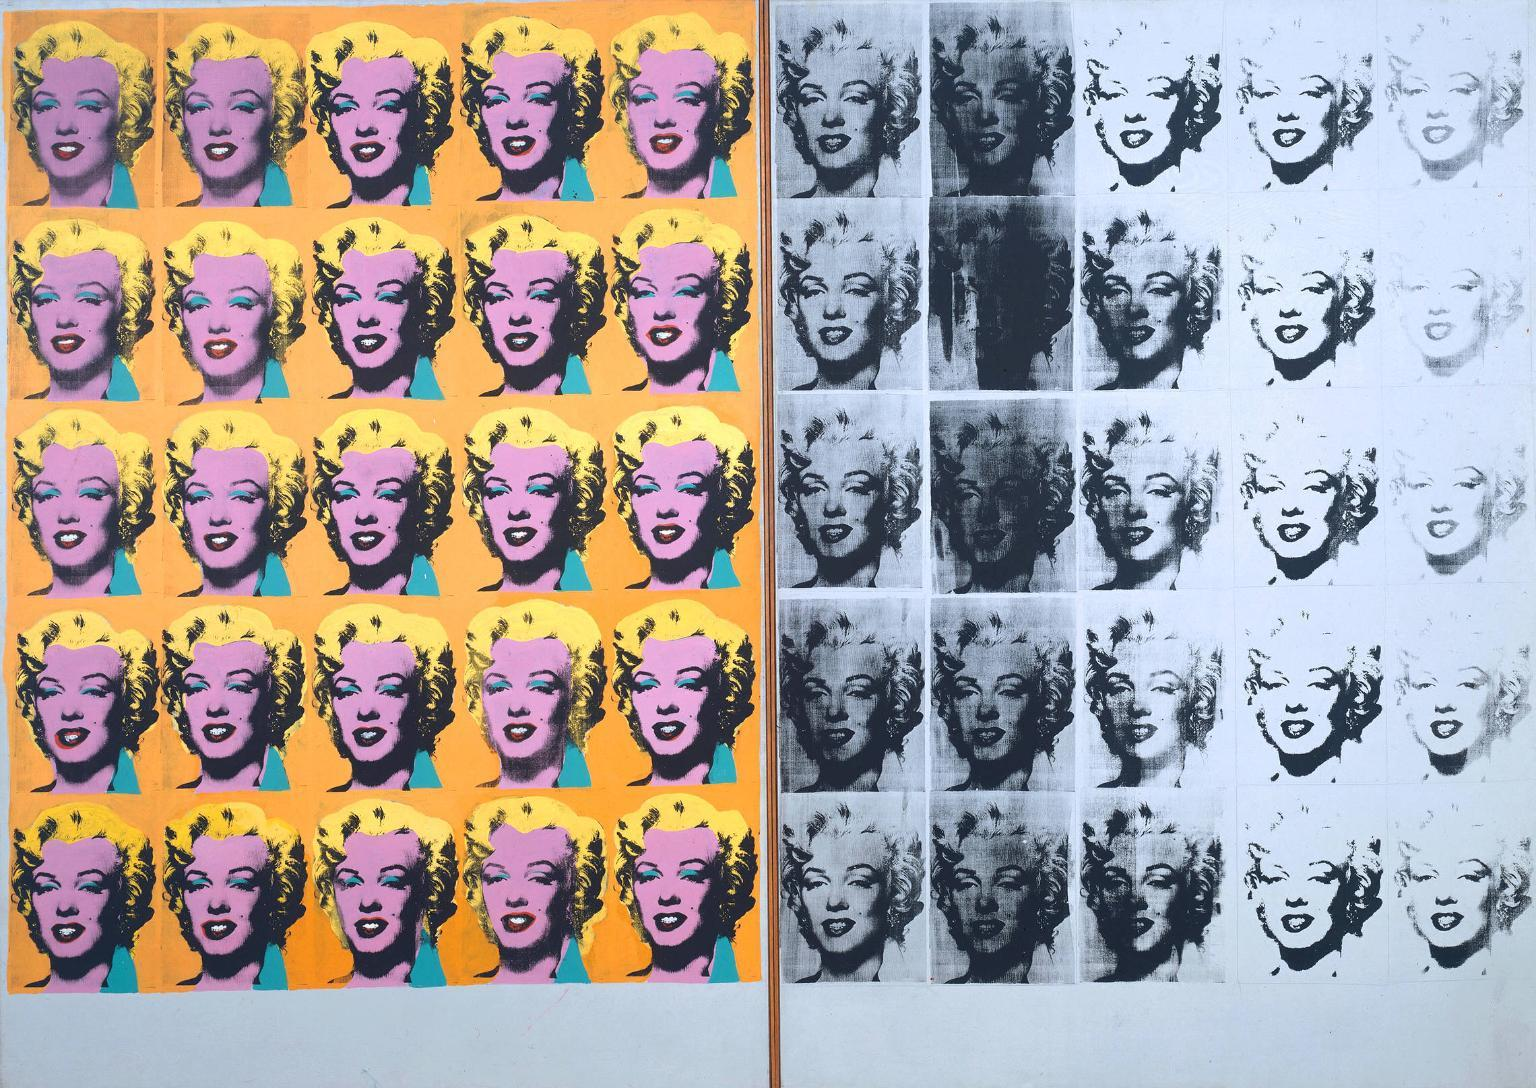 20th century art andy warhol howard bosler artist marilyn diptych 1962